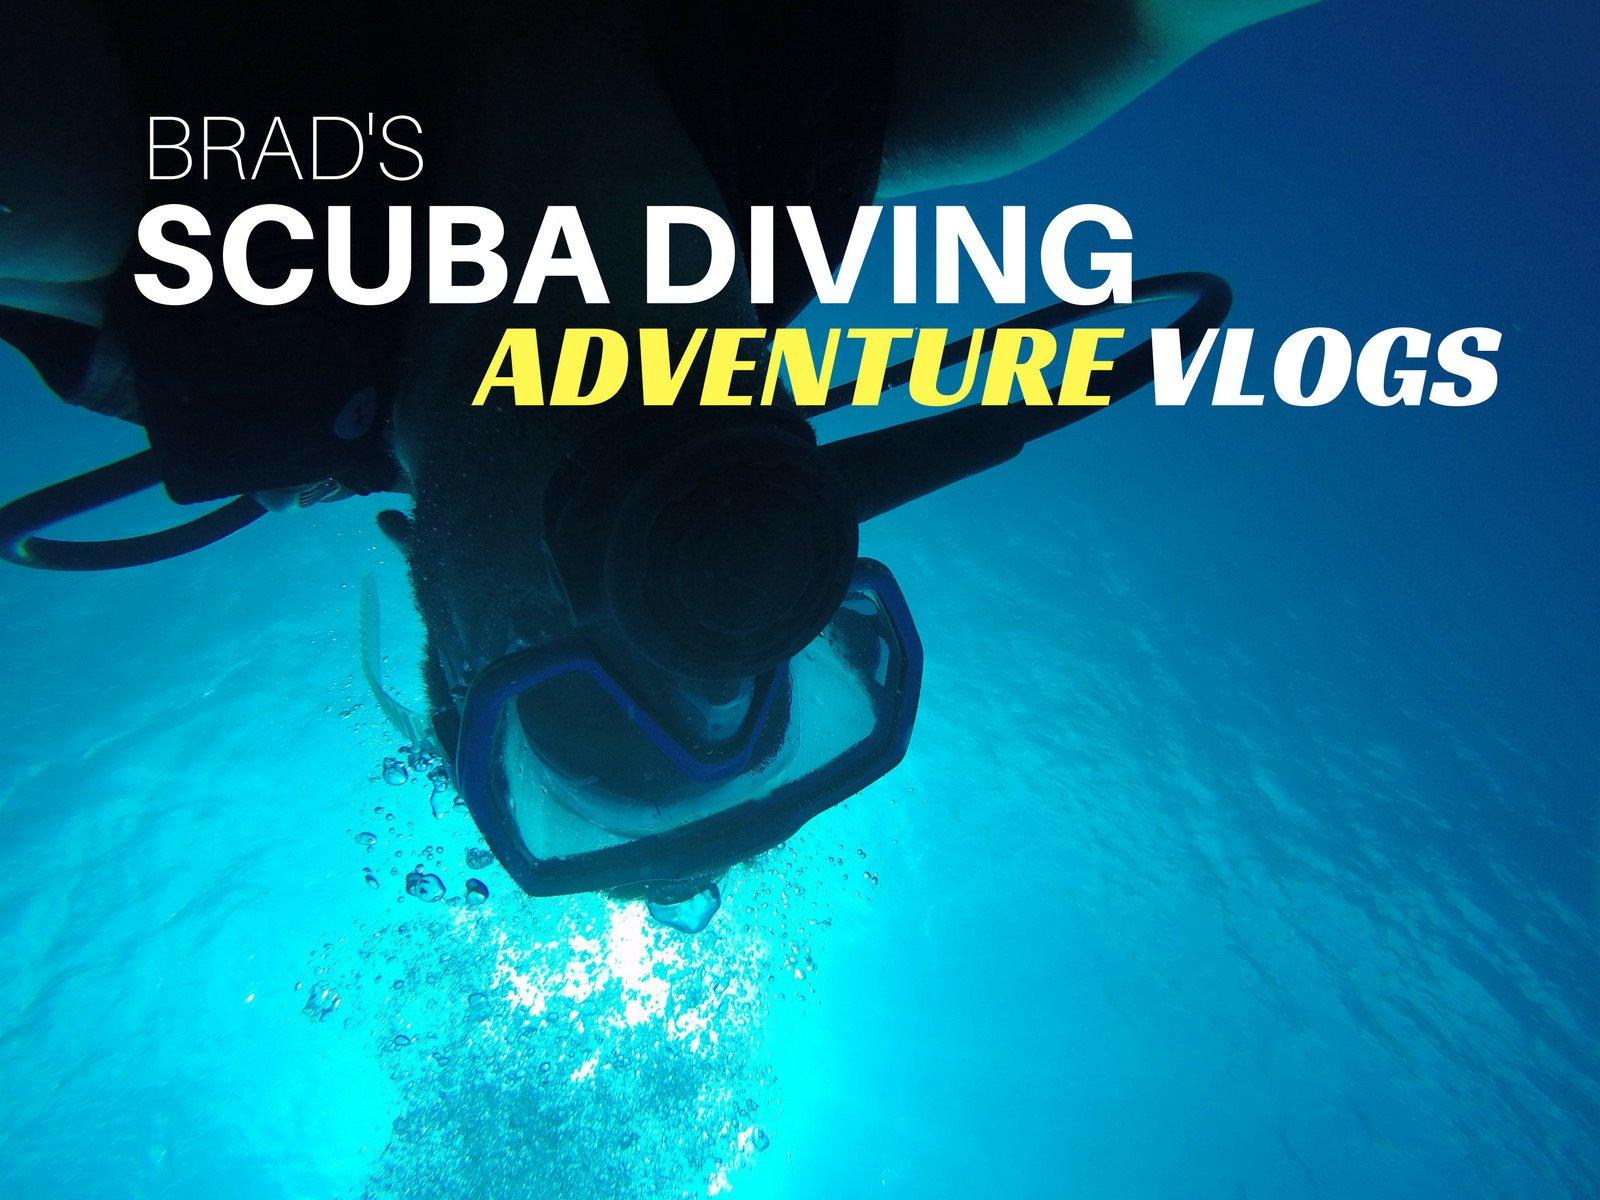 Brad's Scuba Diving Adventure Vlogs - Season 1